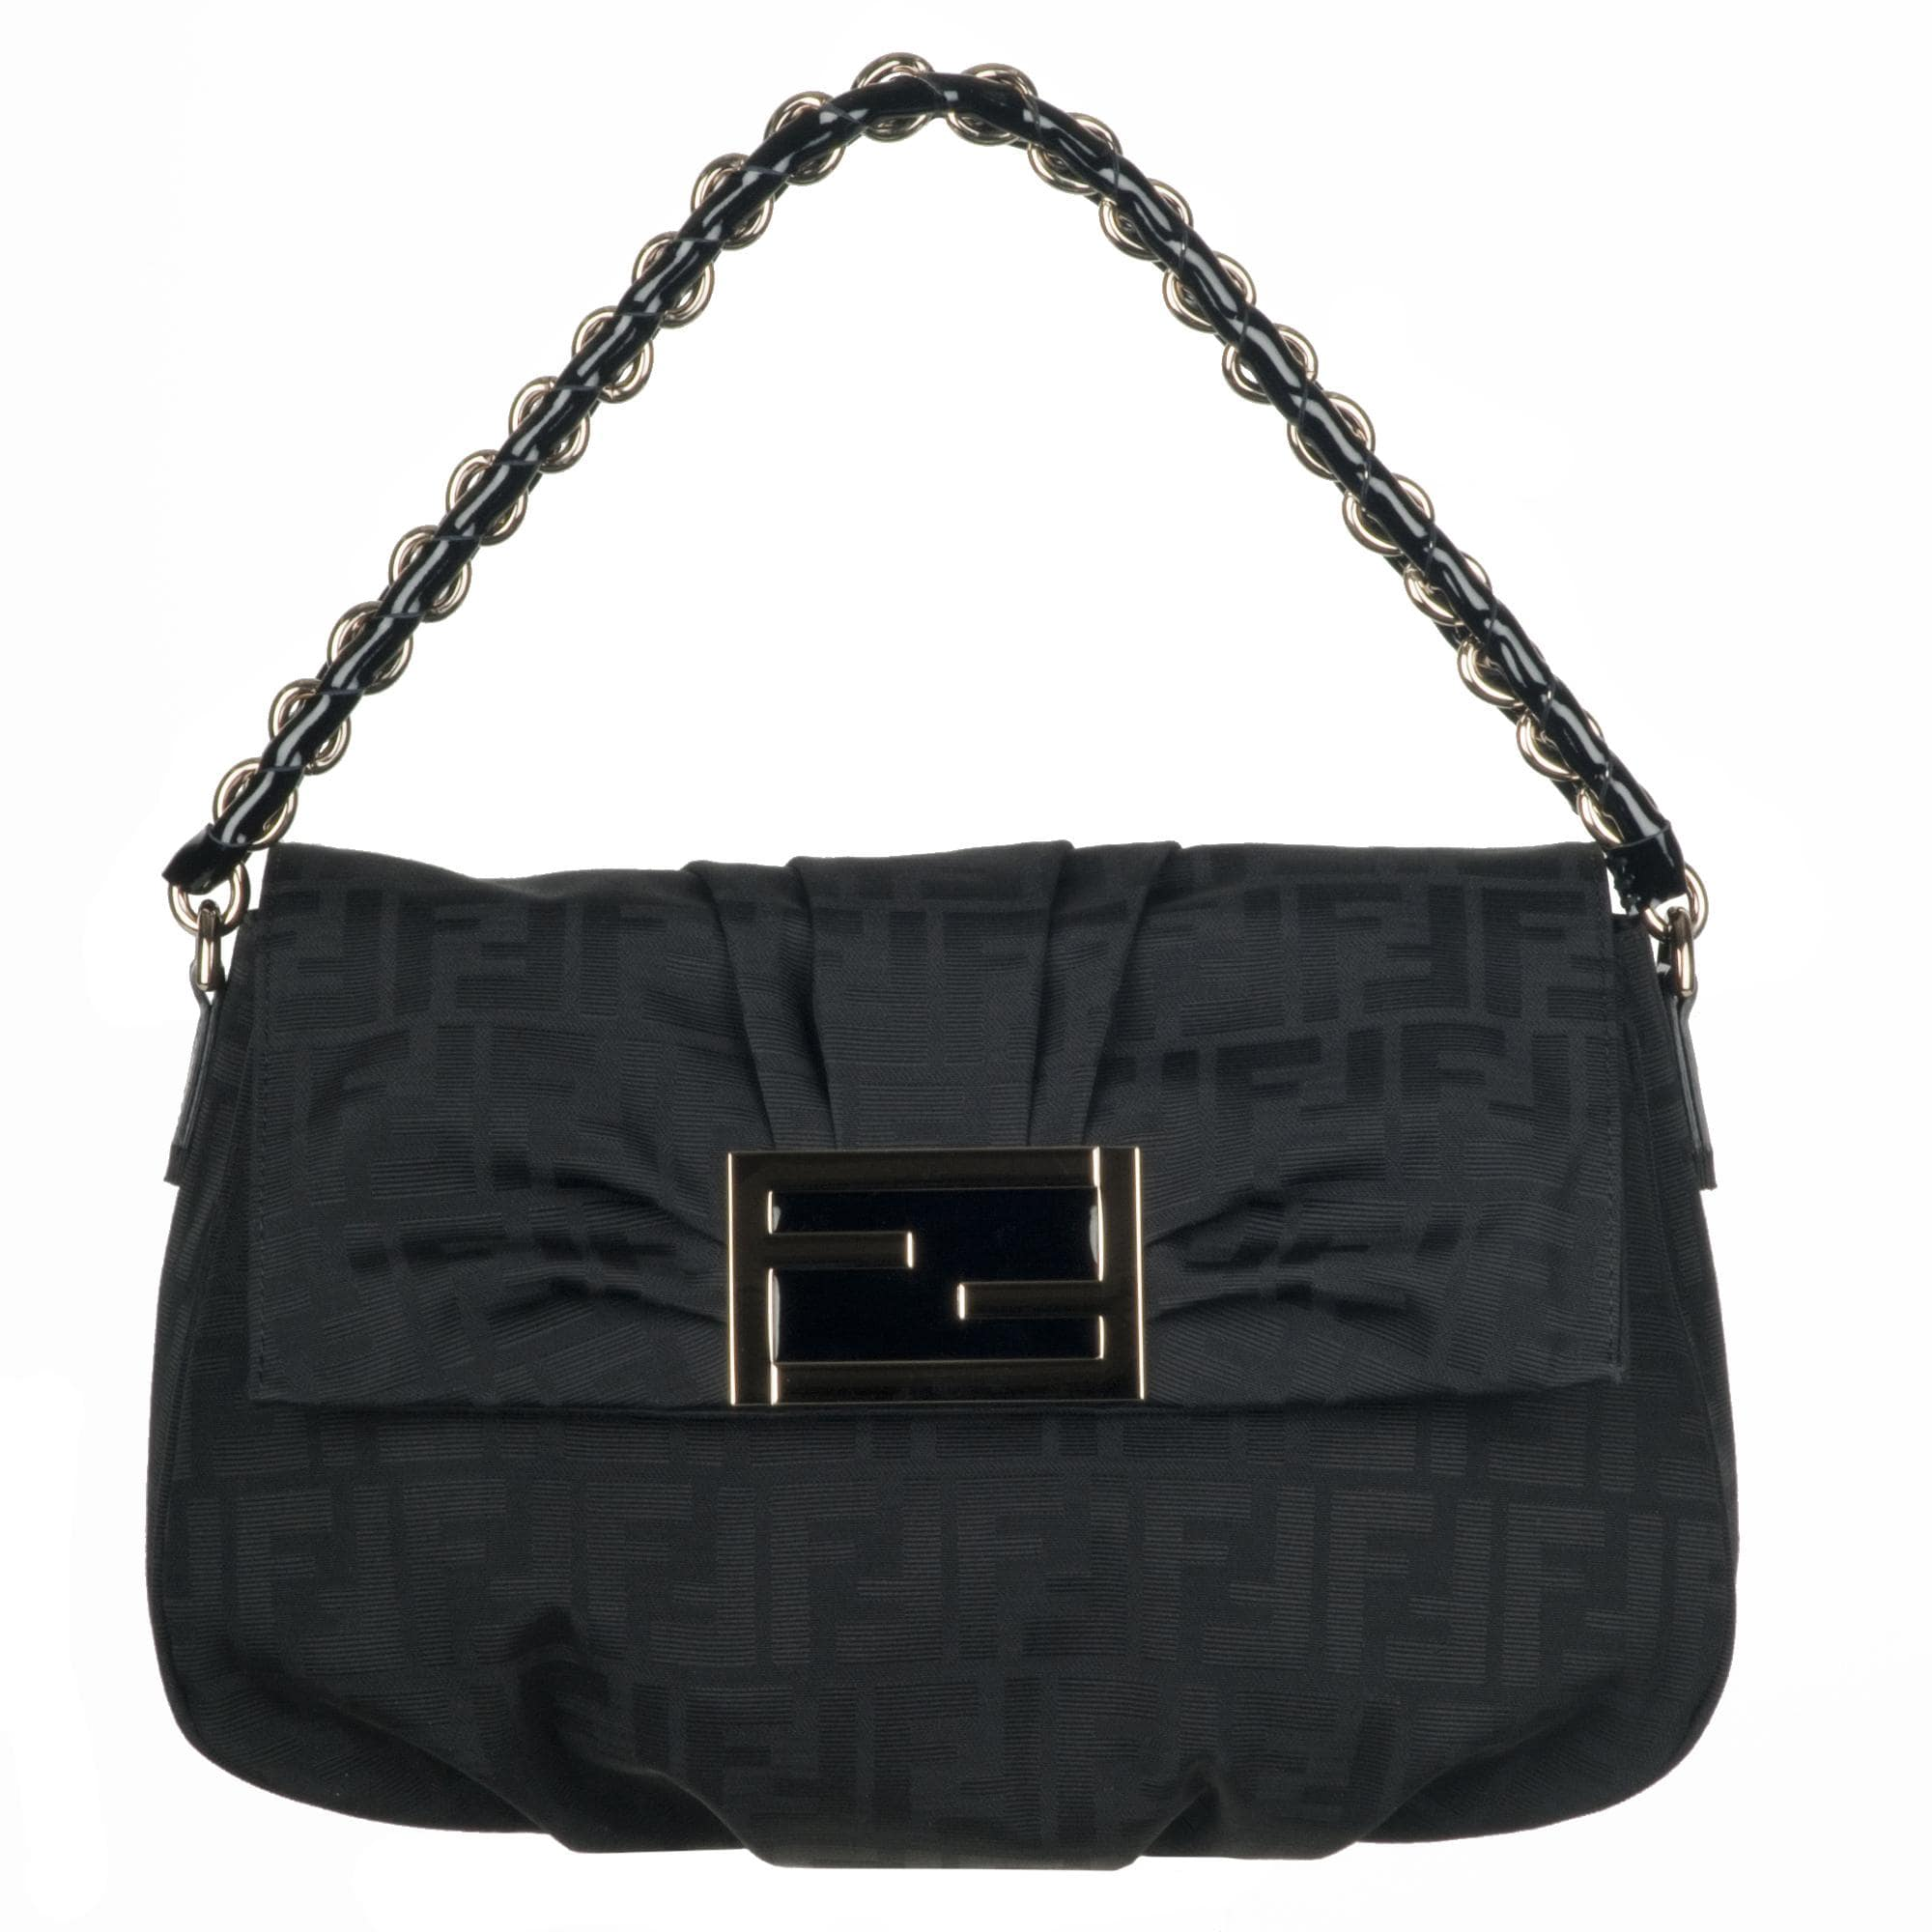 Fendi 'Mia-Zucca' Black Canvas Shopper Bag